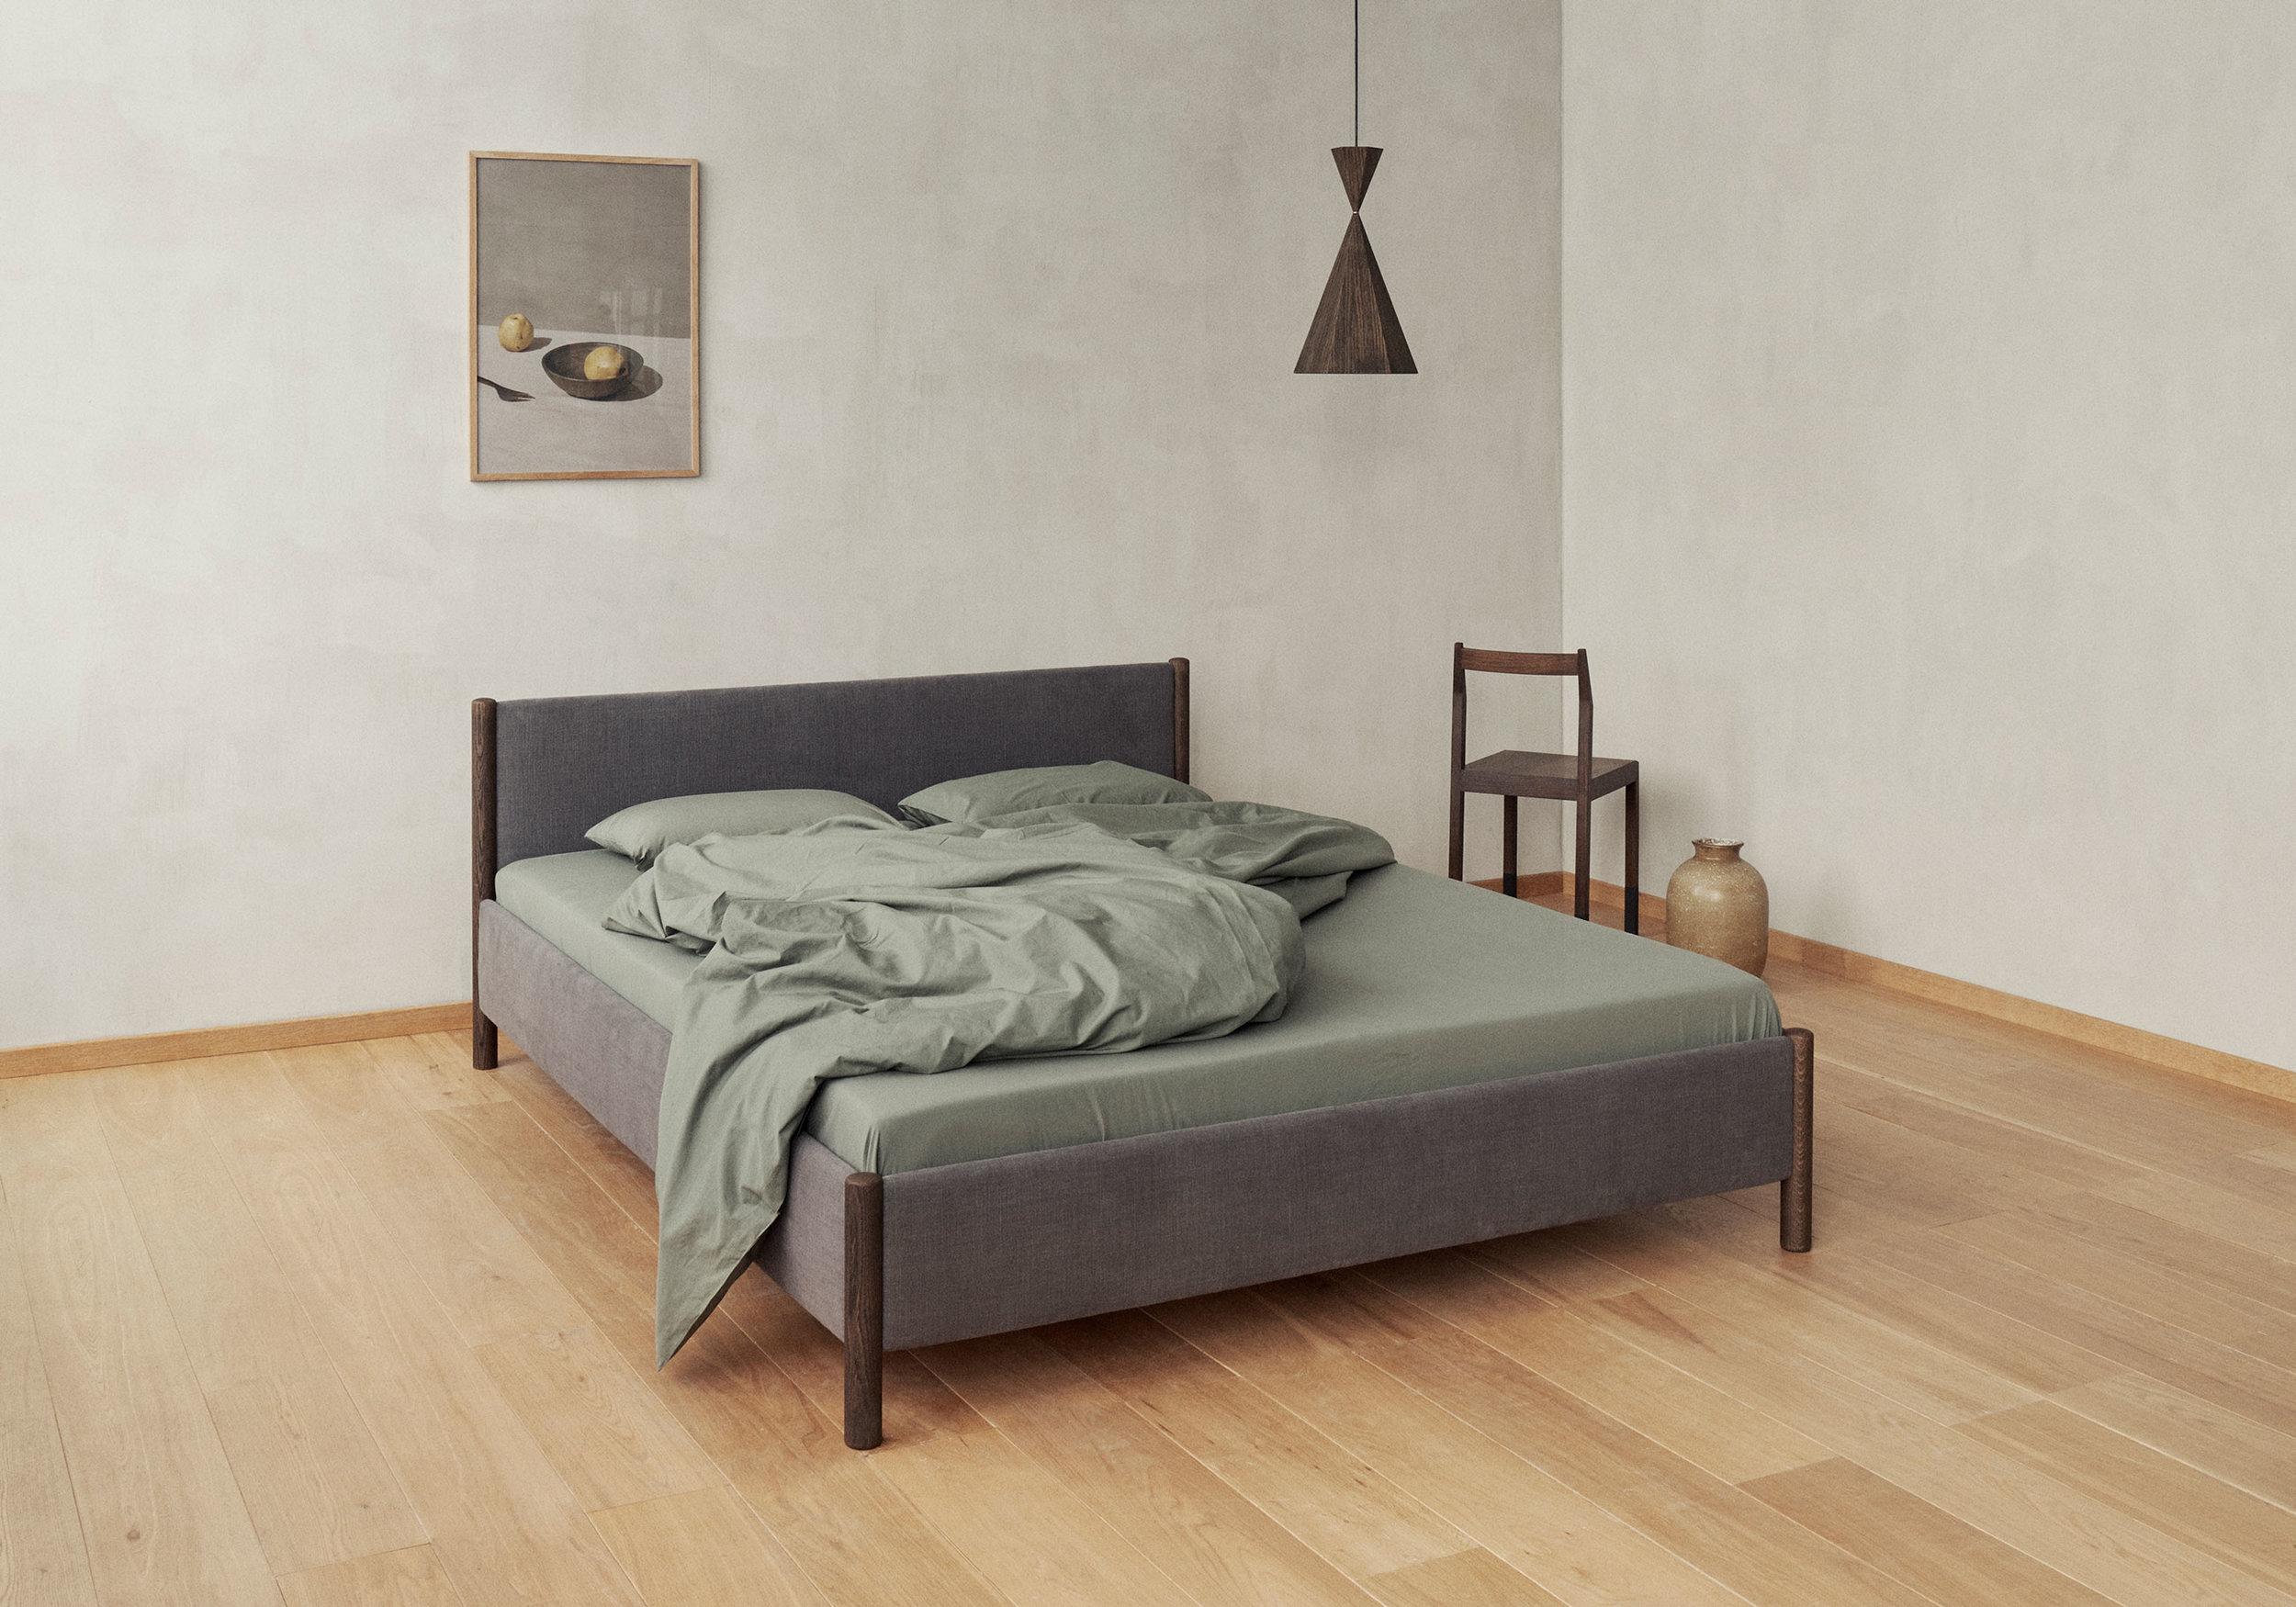 021-VENG-BED-AT-THE-LAB-RE-BEDS-DESIGN-BY-OLIVER-&-LUKAS-WEISSKROGH.jpg